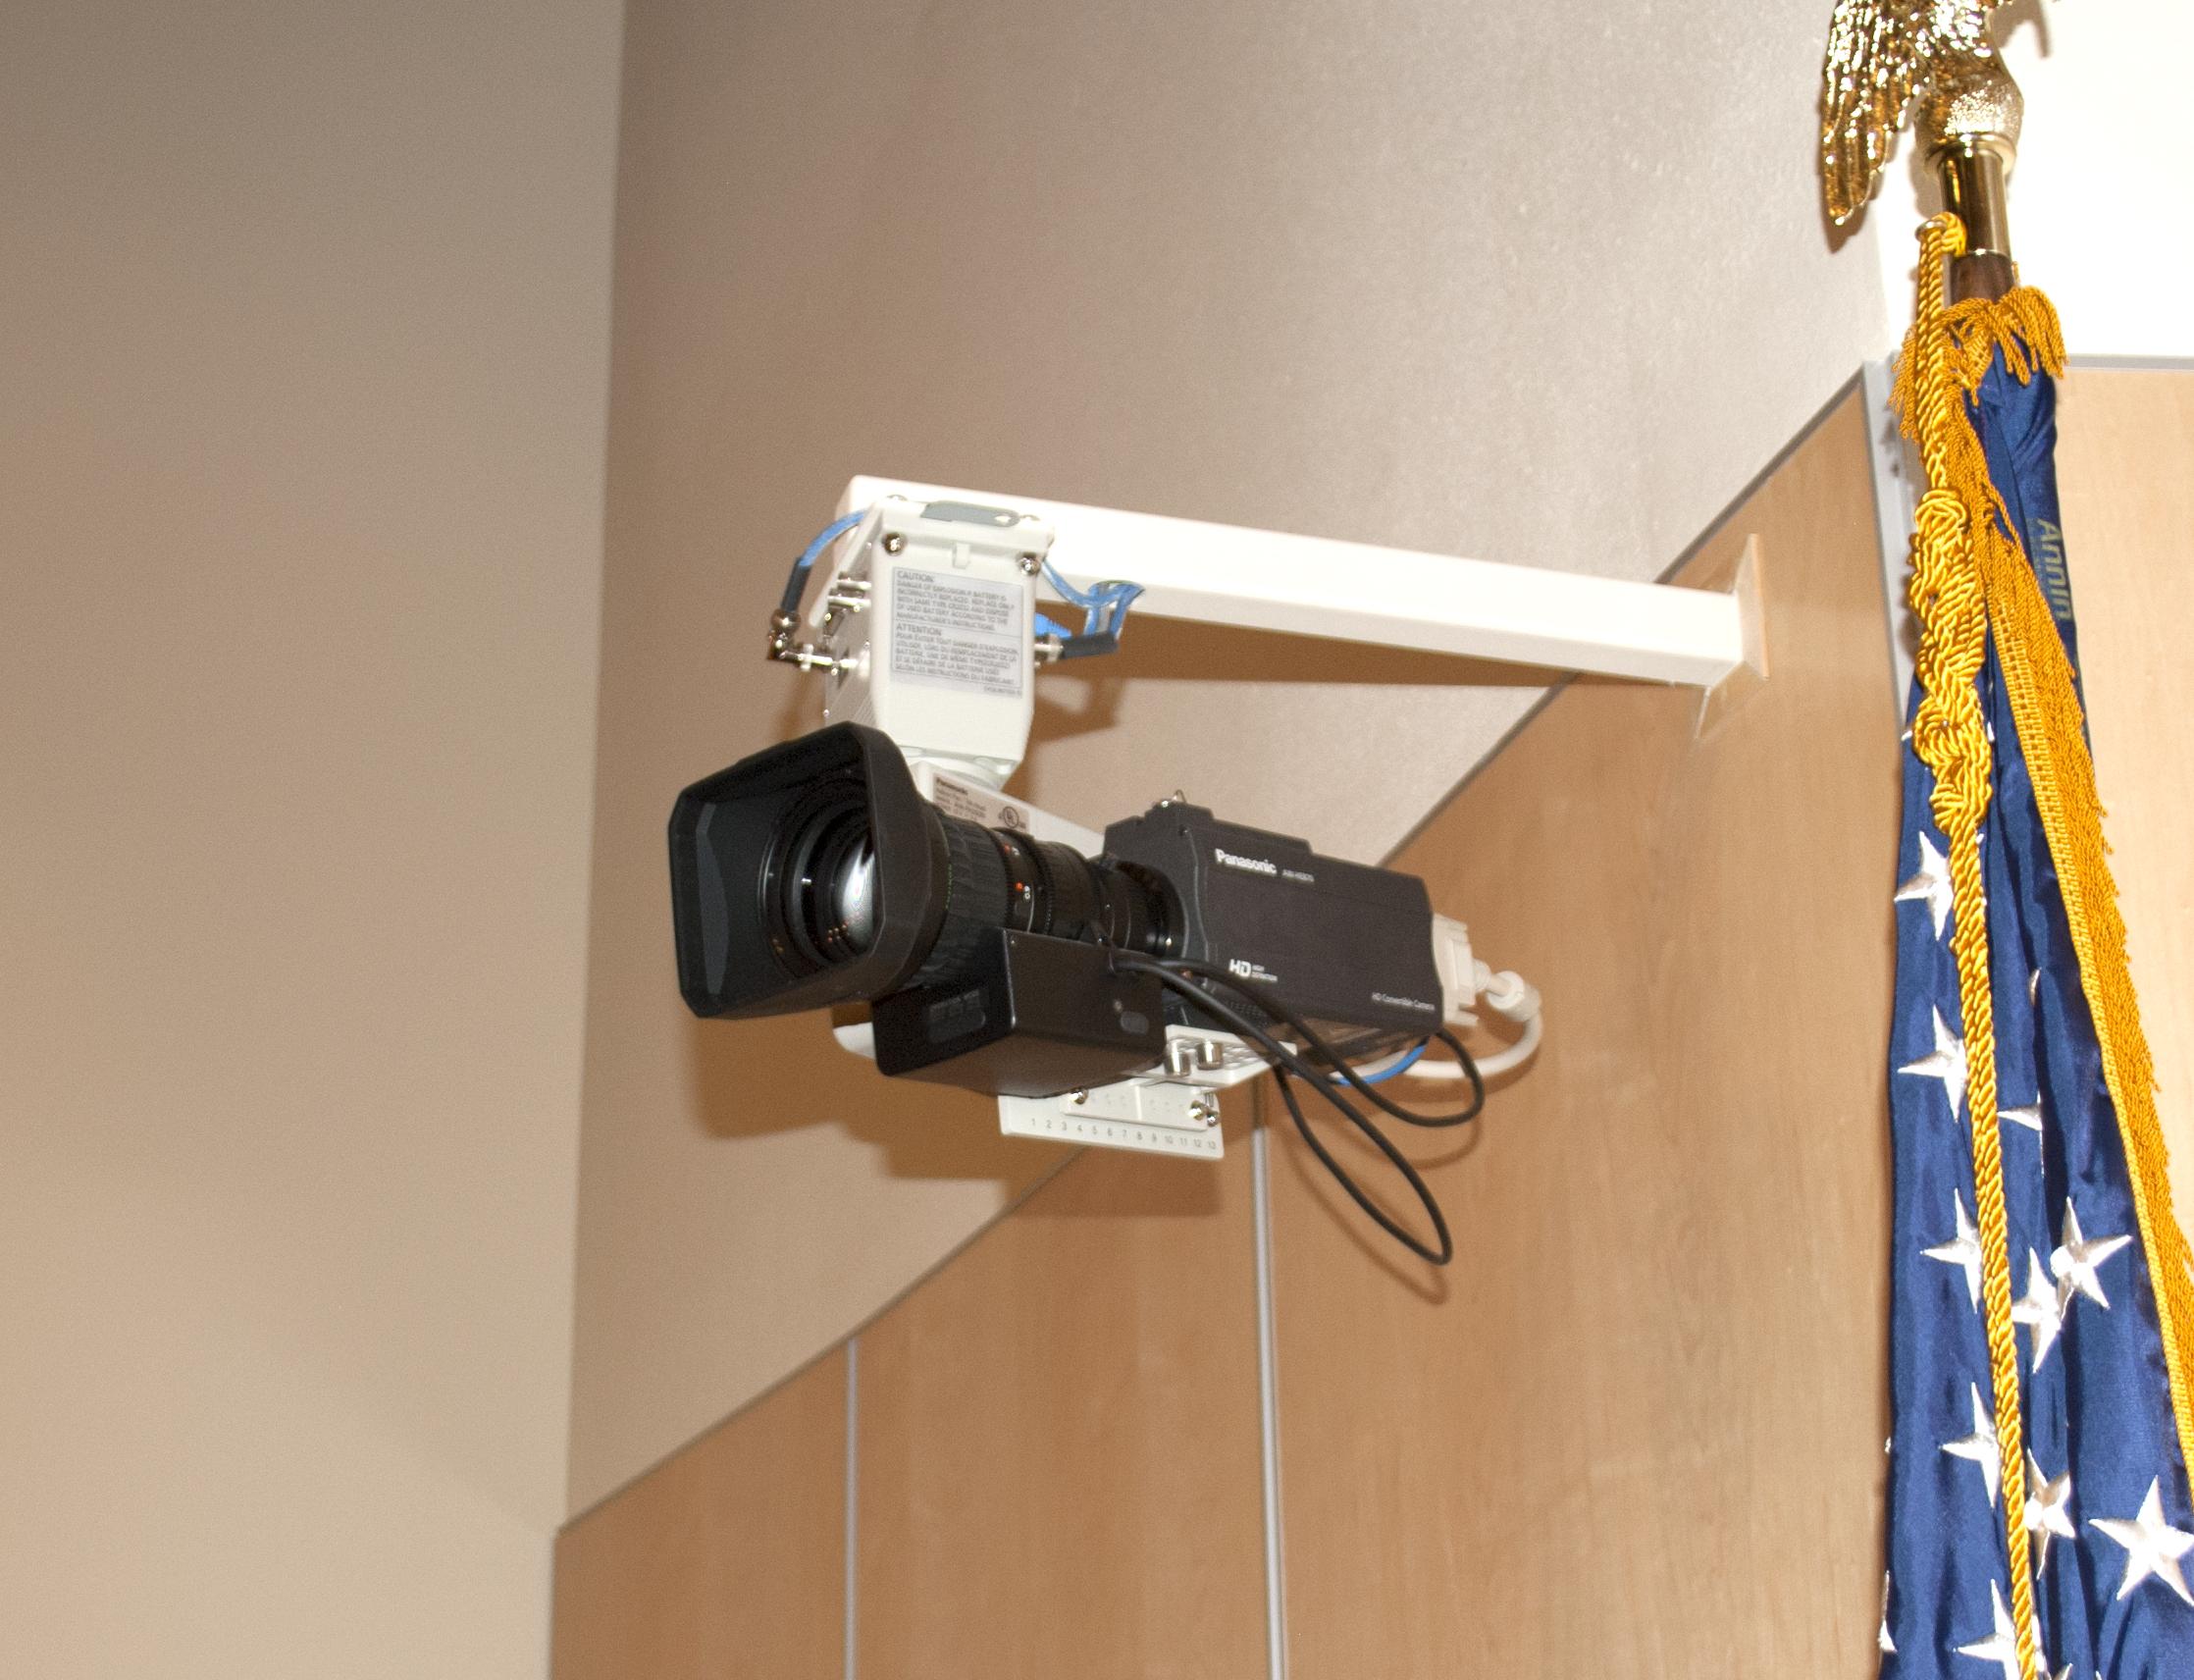 HD Pan Tilt Zoom Camera